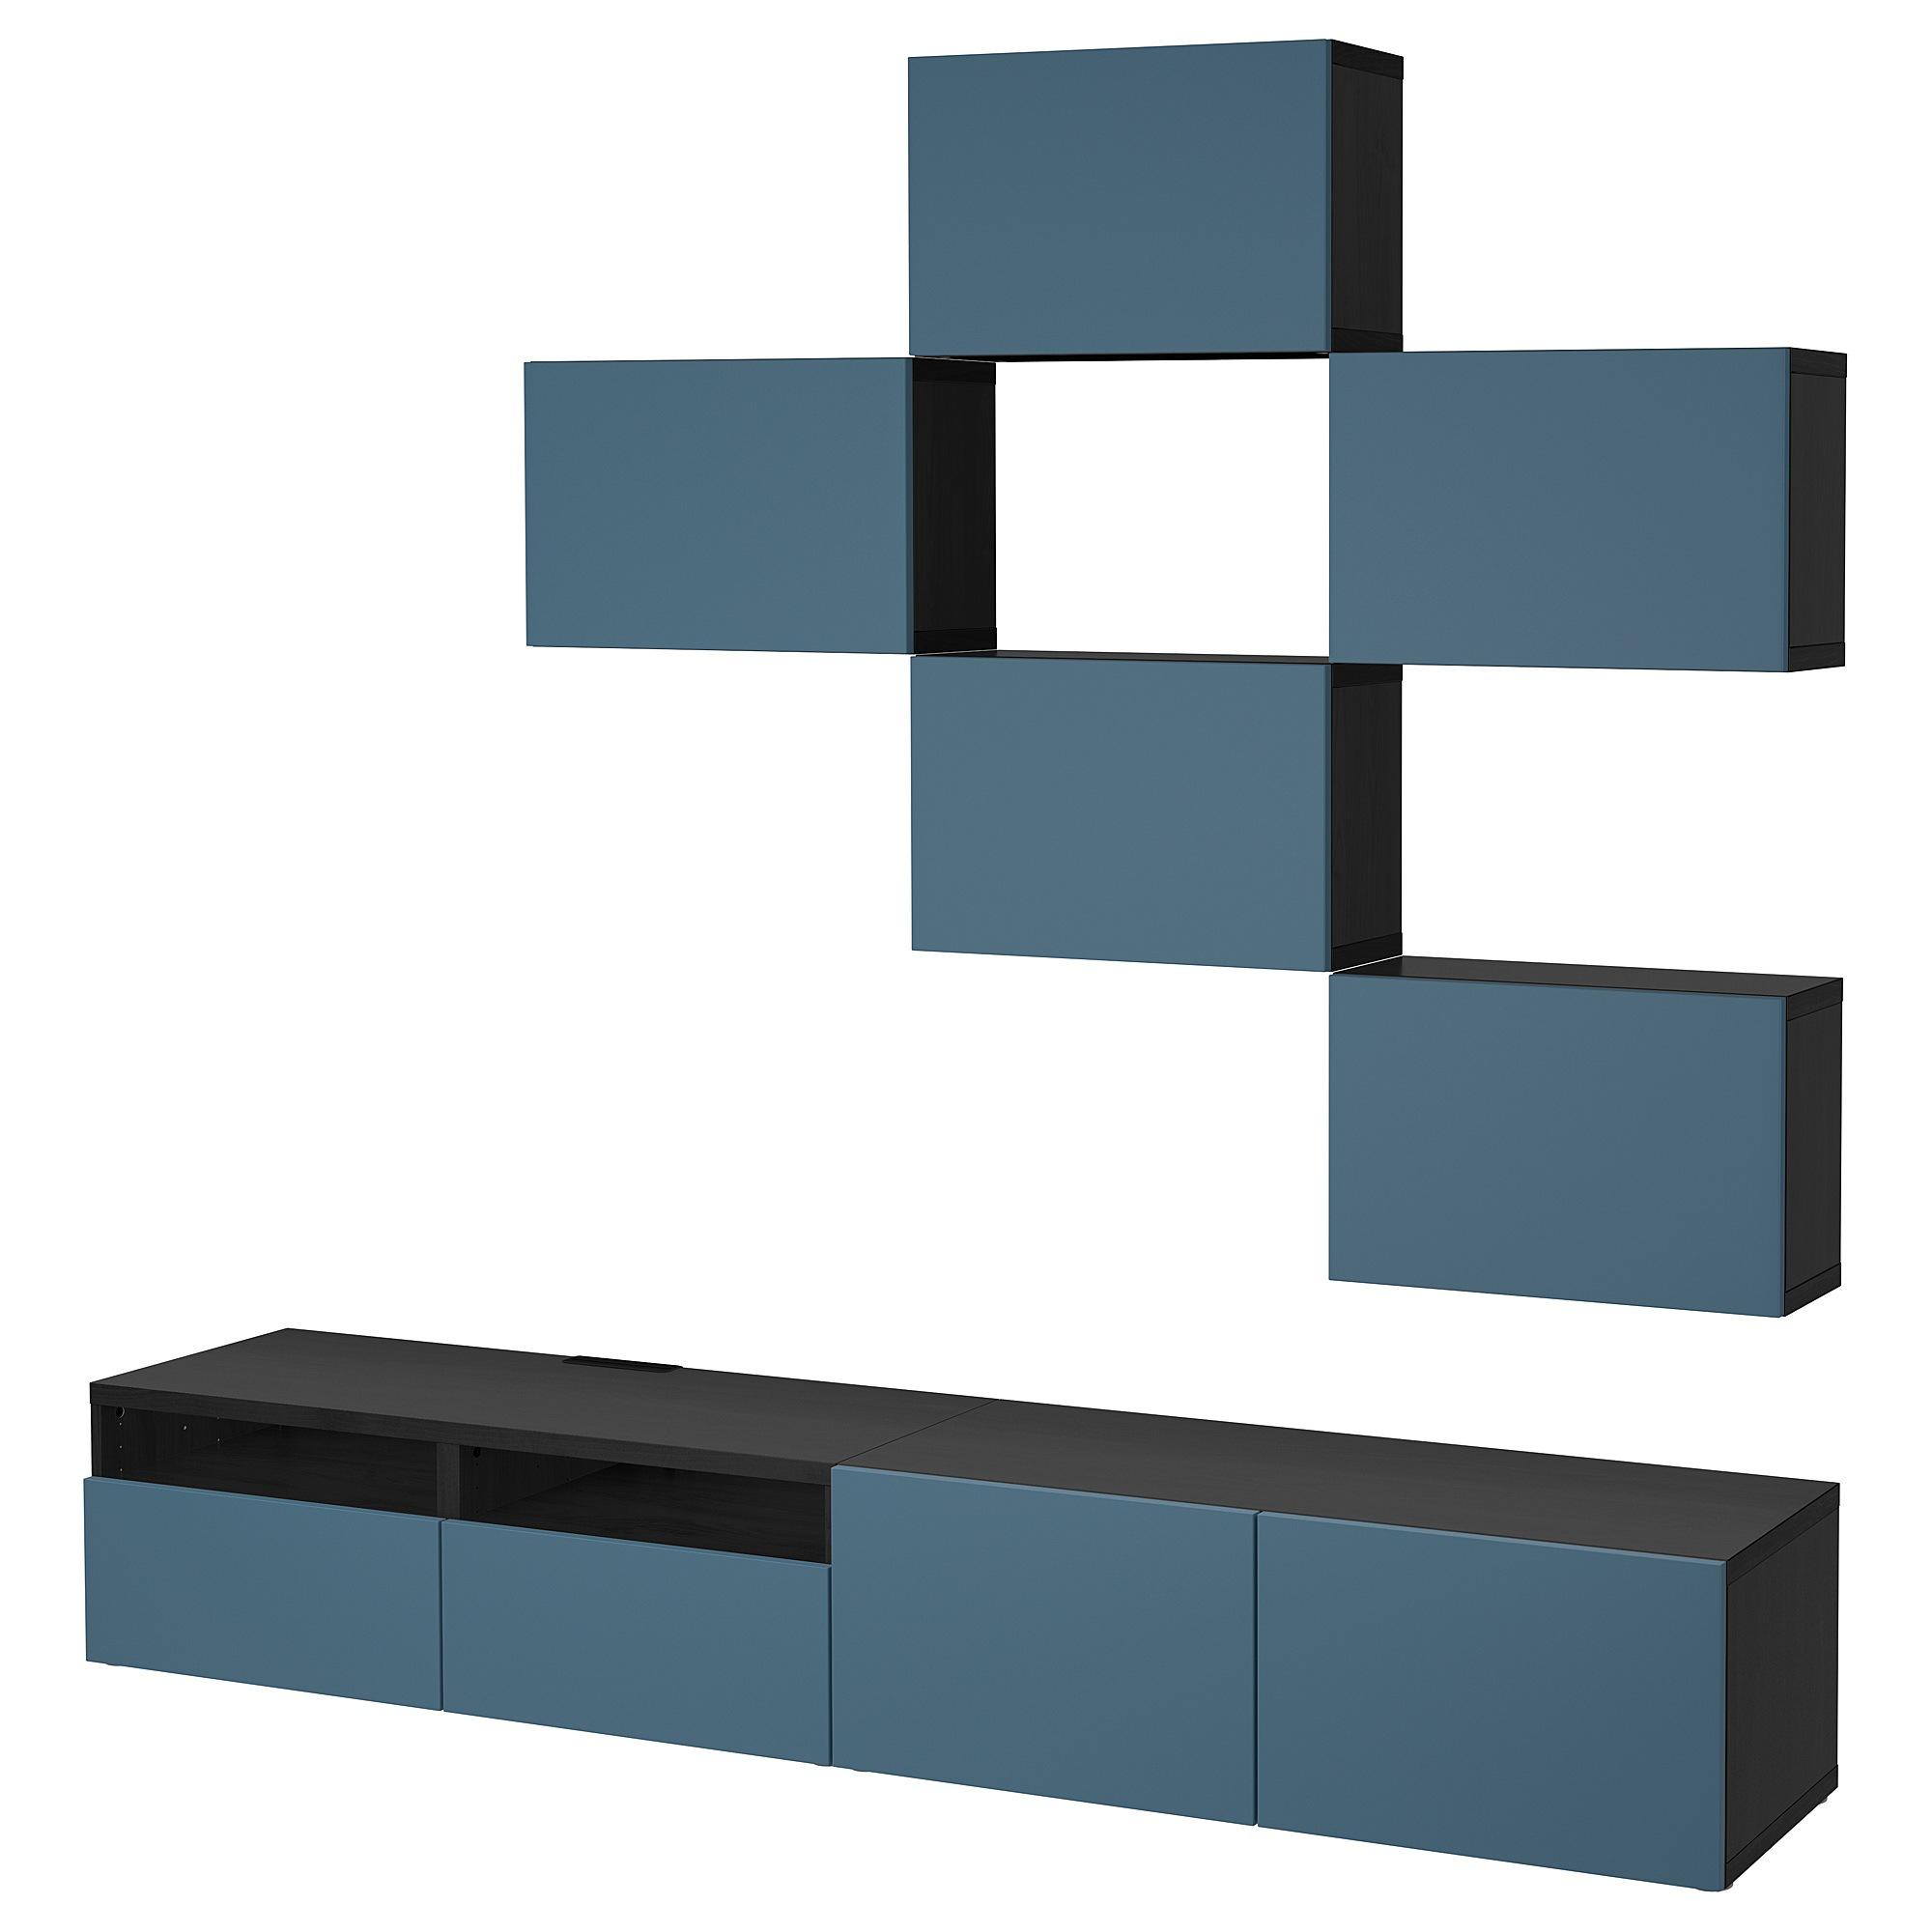 Шкаф для ТВ, комбинация БЕСТО темно-синий артикуль № 092.516.78 в наличии. Онлайн магазин IKEA Беларусь. Недорогая доставка и соборка.